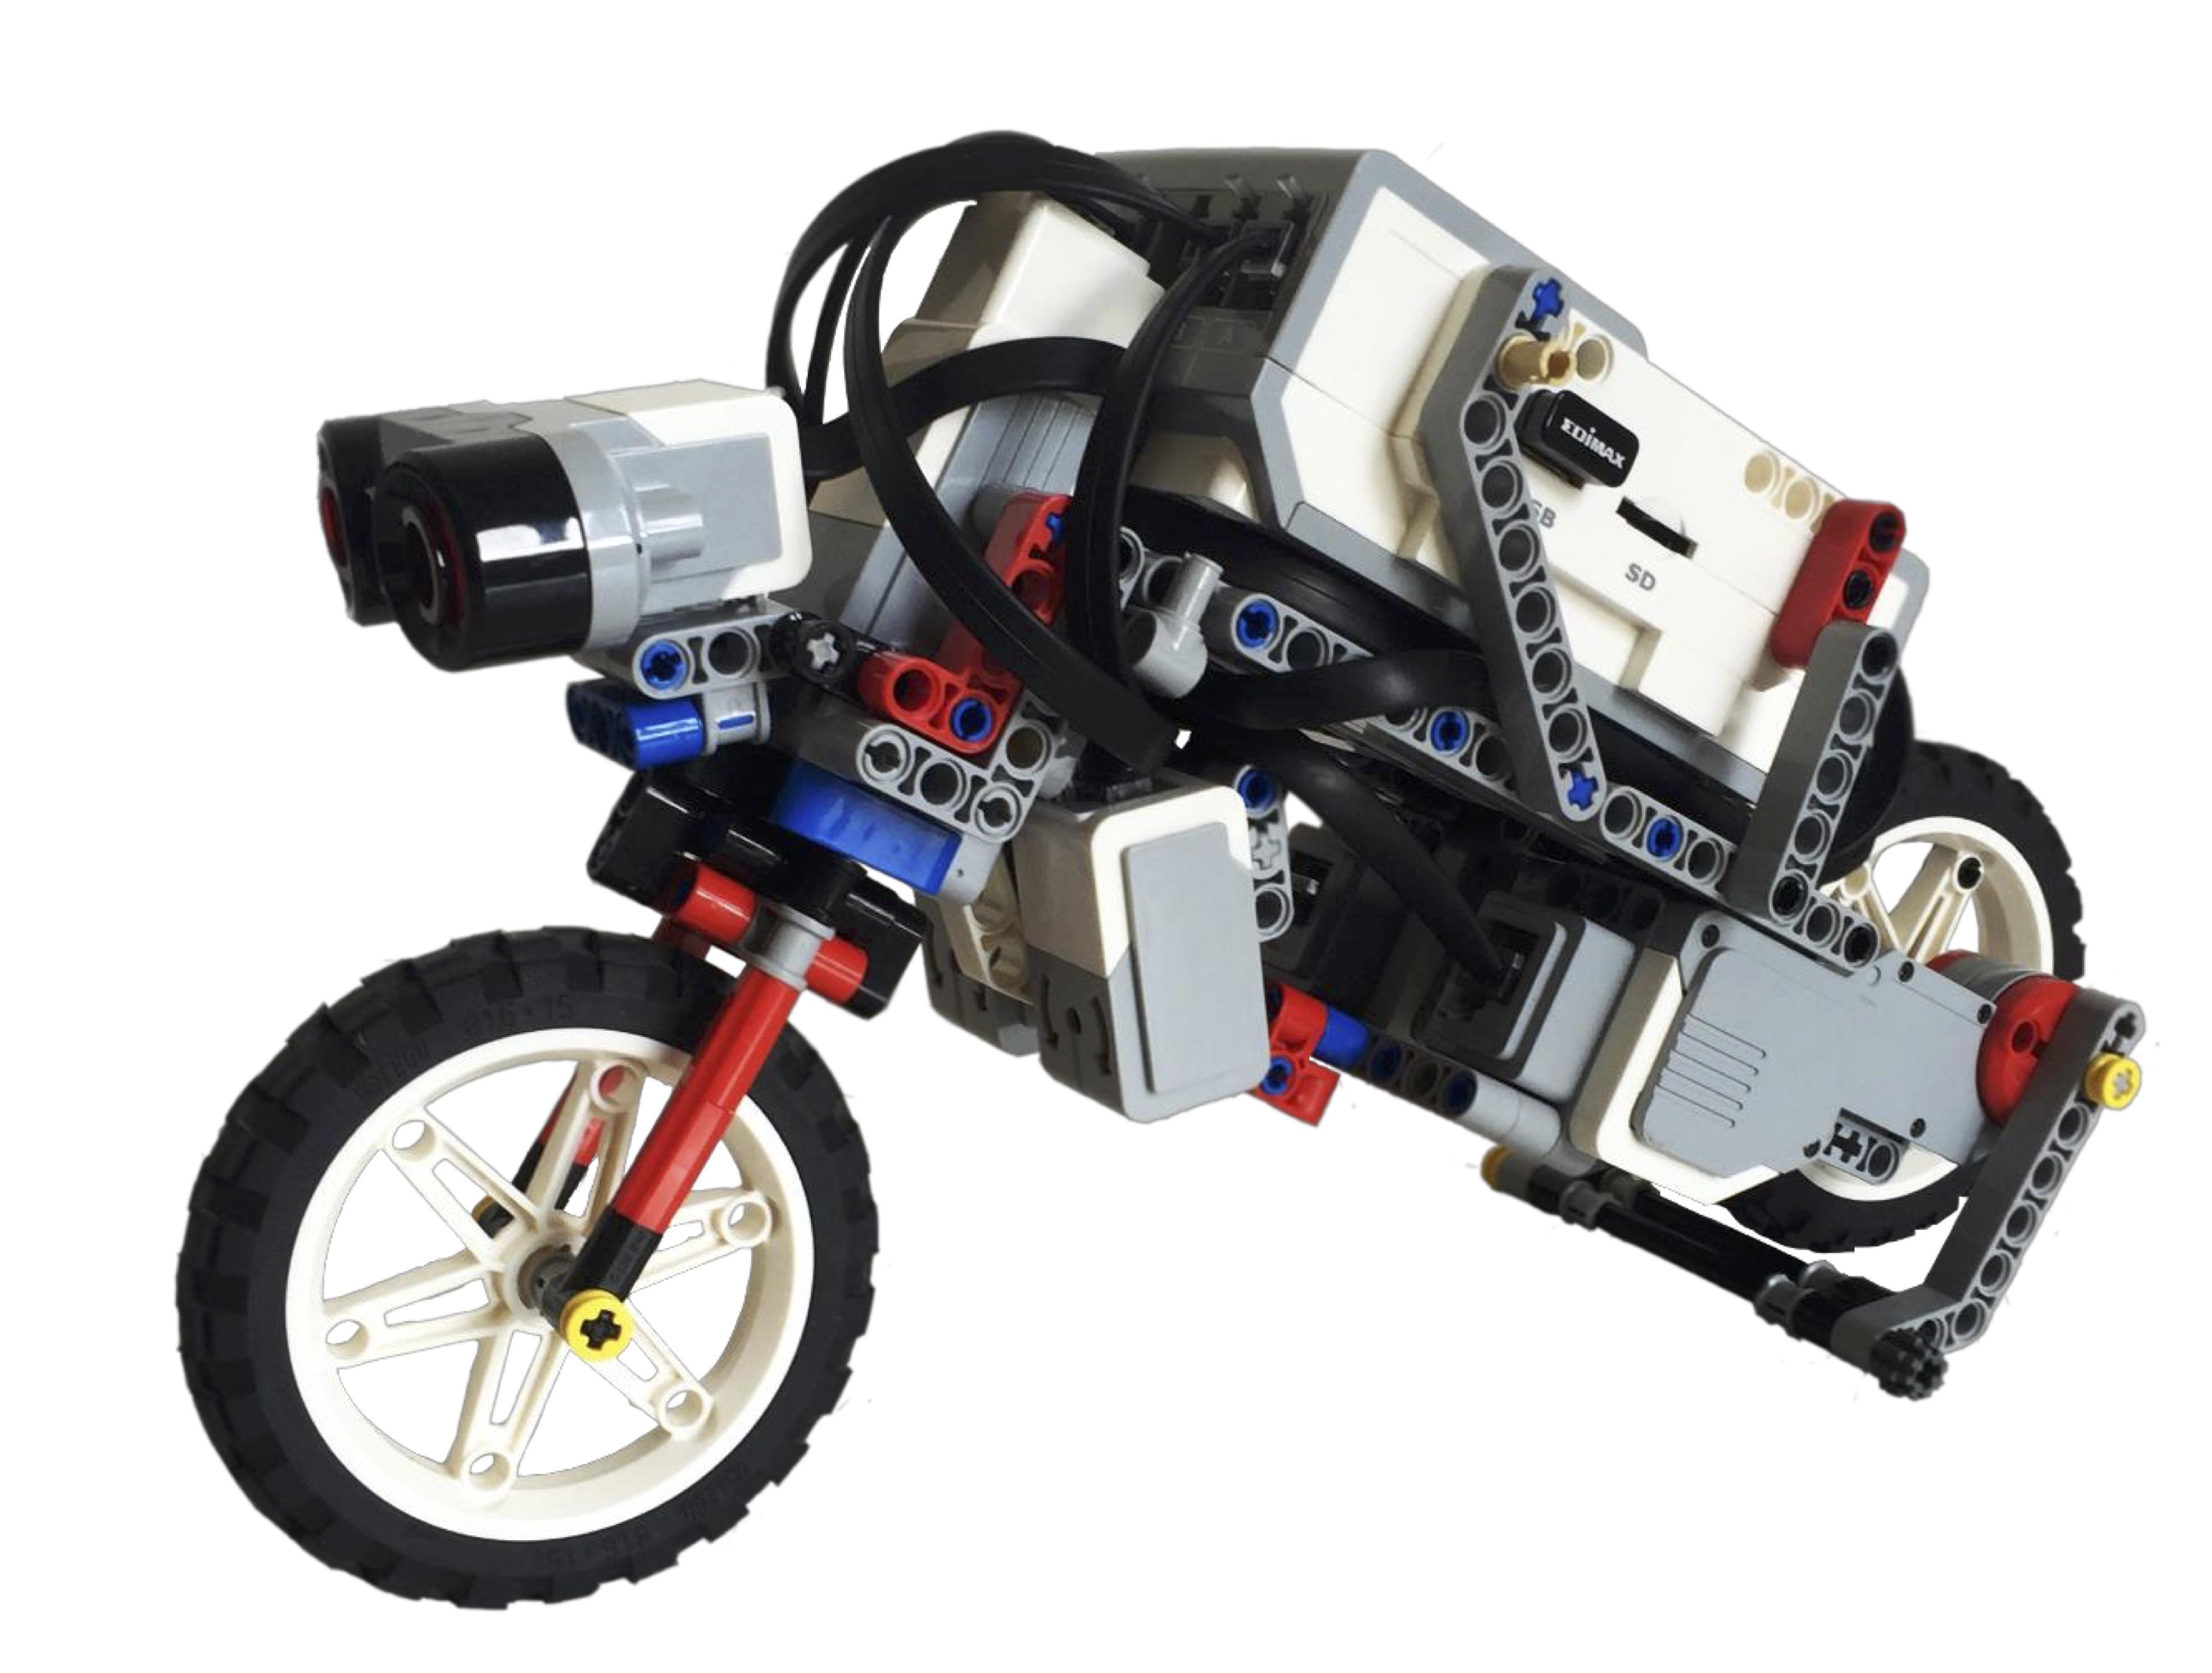 Fabuleux Lego Mindstorms EV3 bike project - File Exchange - MATLAB Central MA33